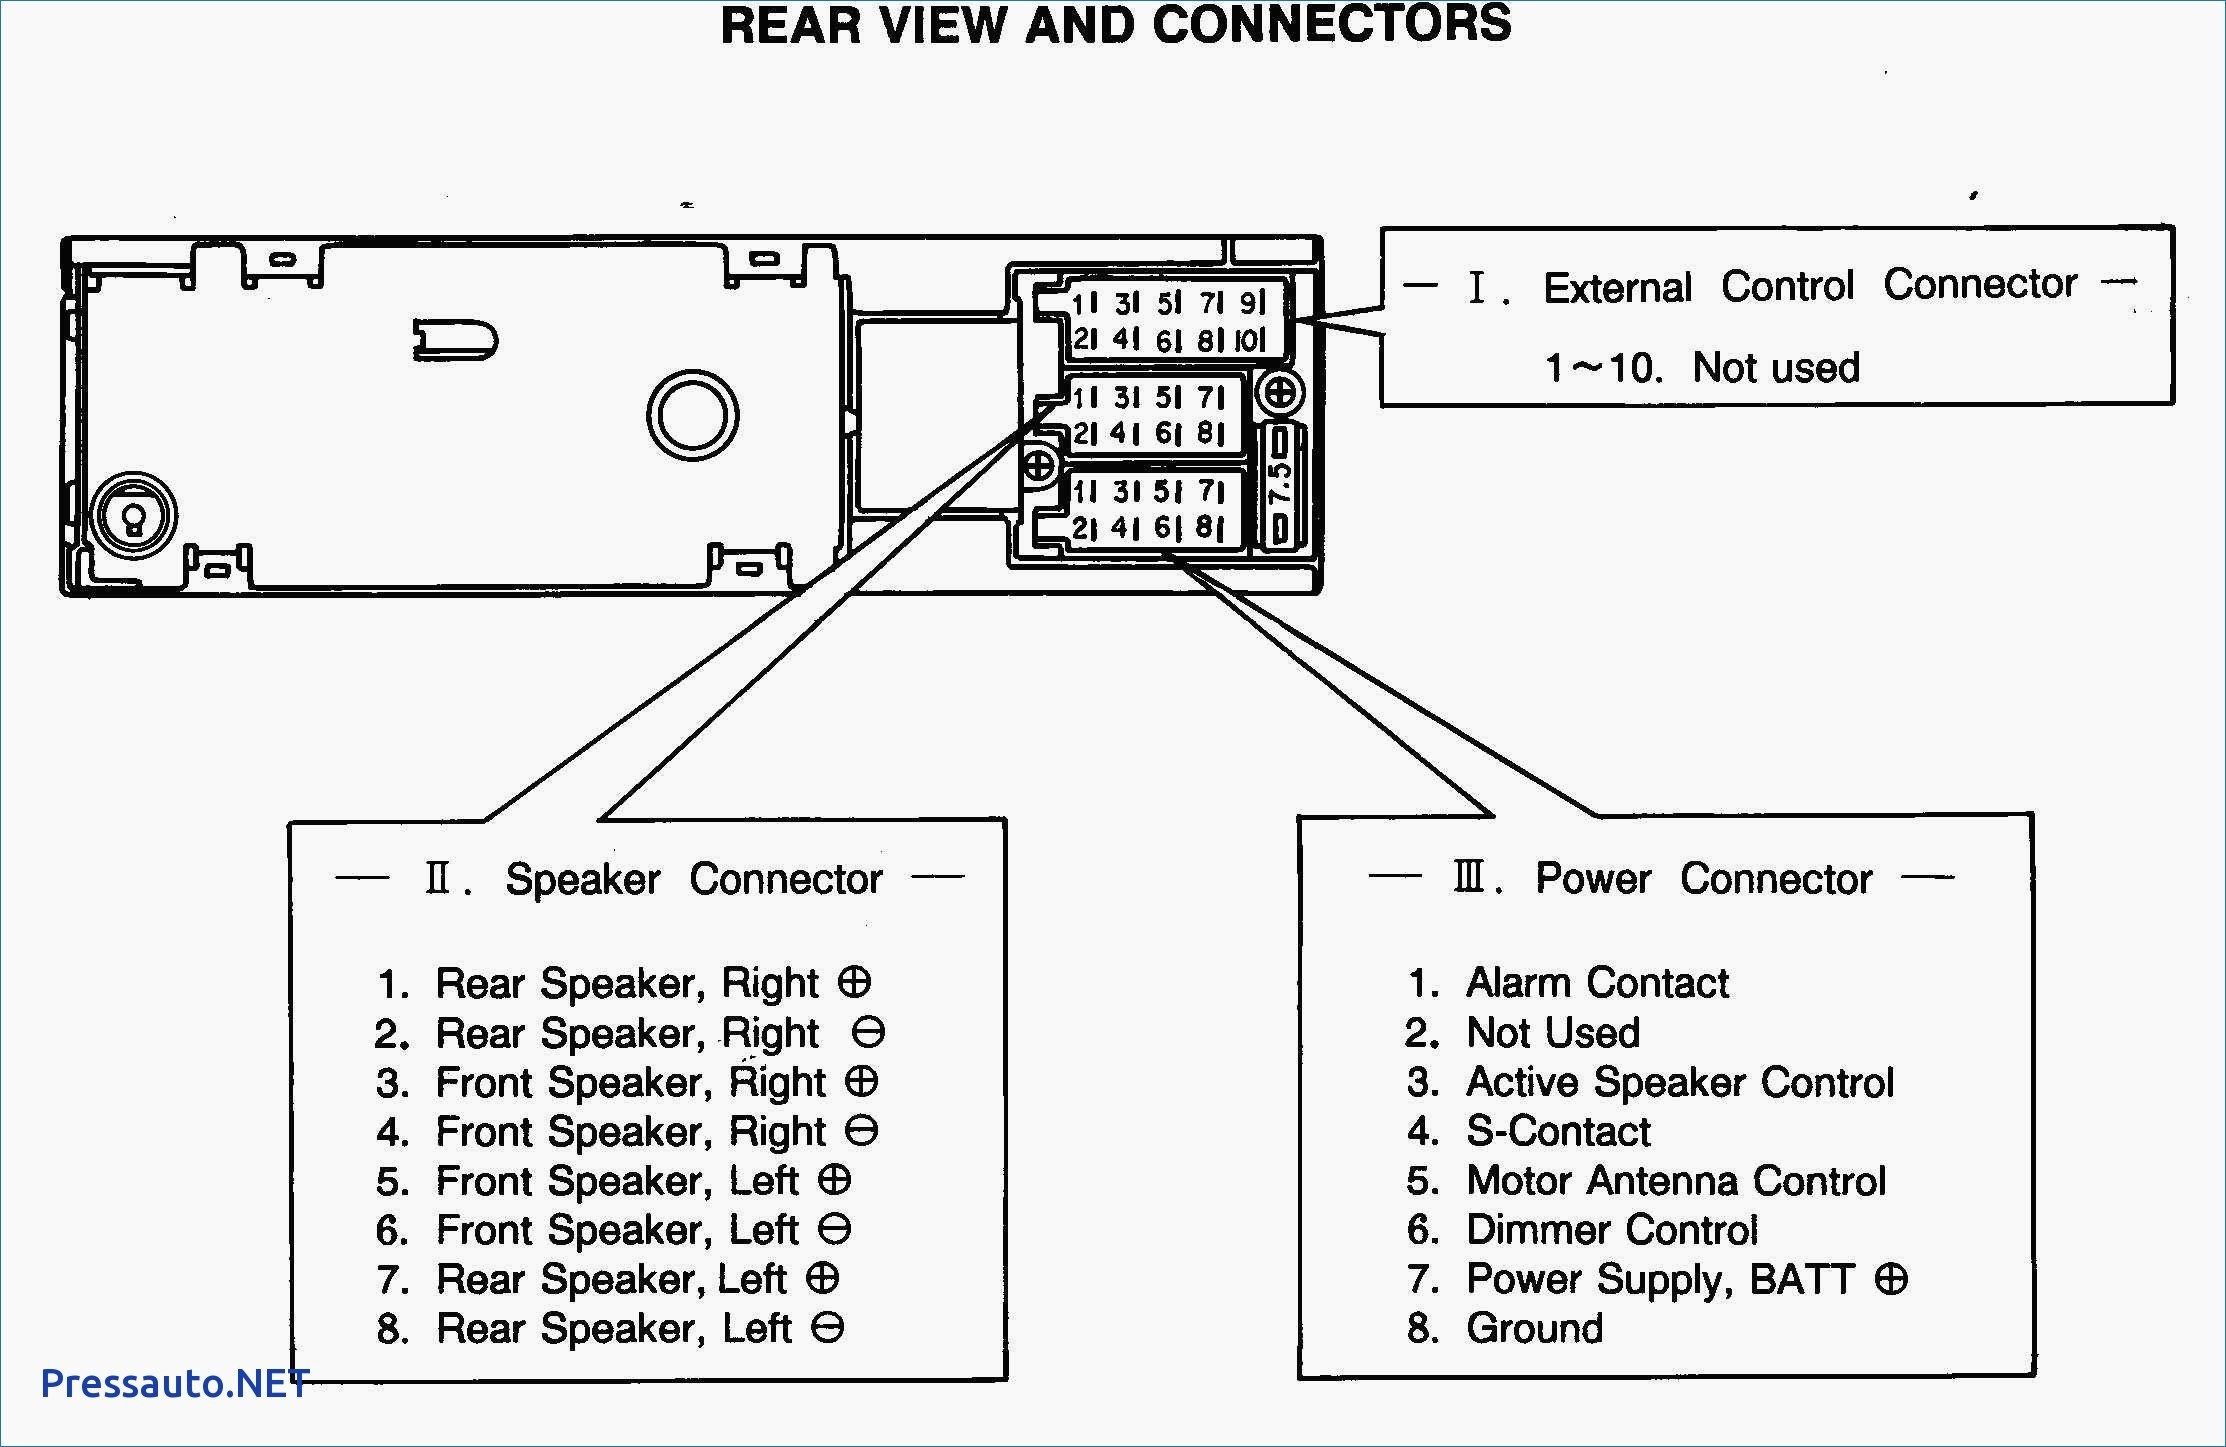 The12volt Wiring Diagrams Elegant Thermo King Tripac Apu Diagram And